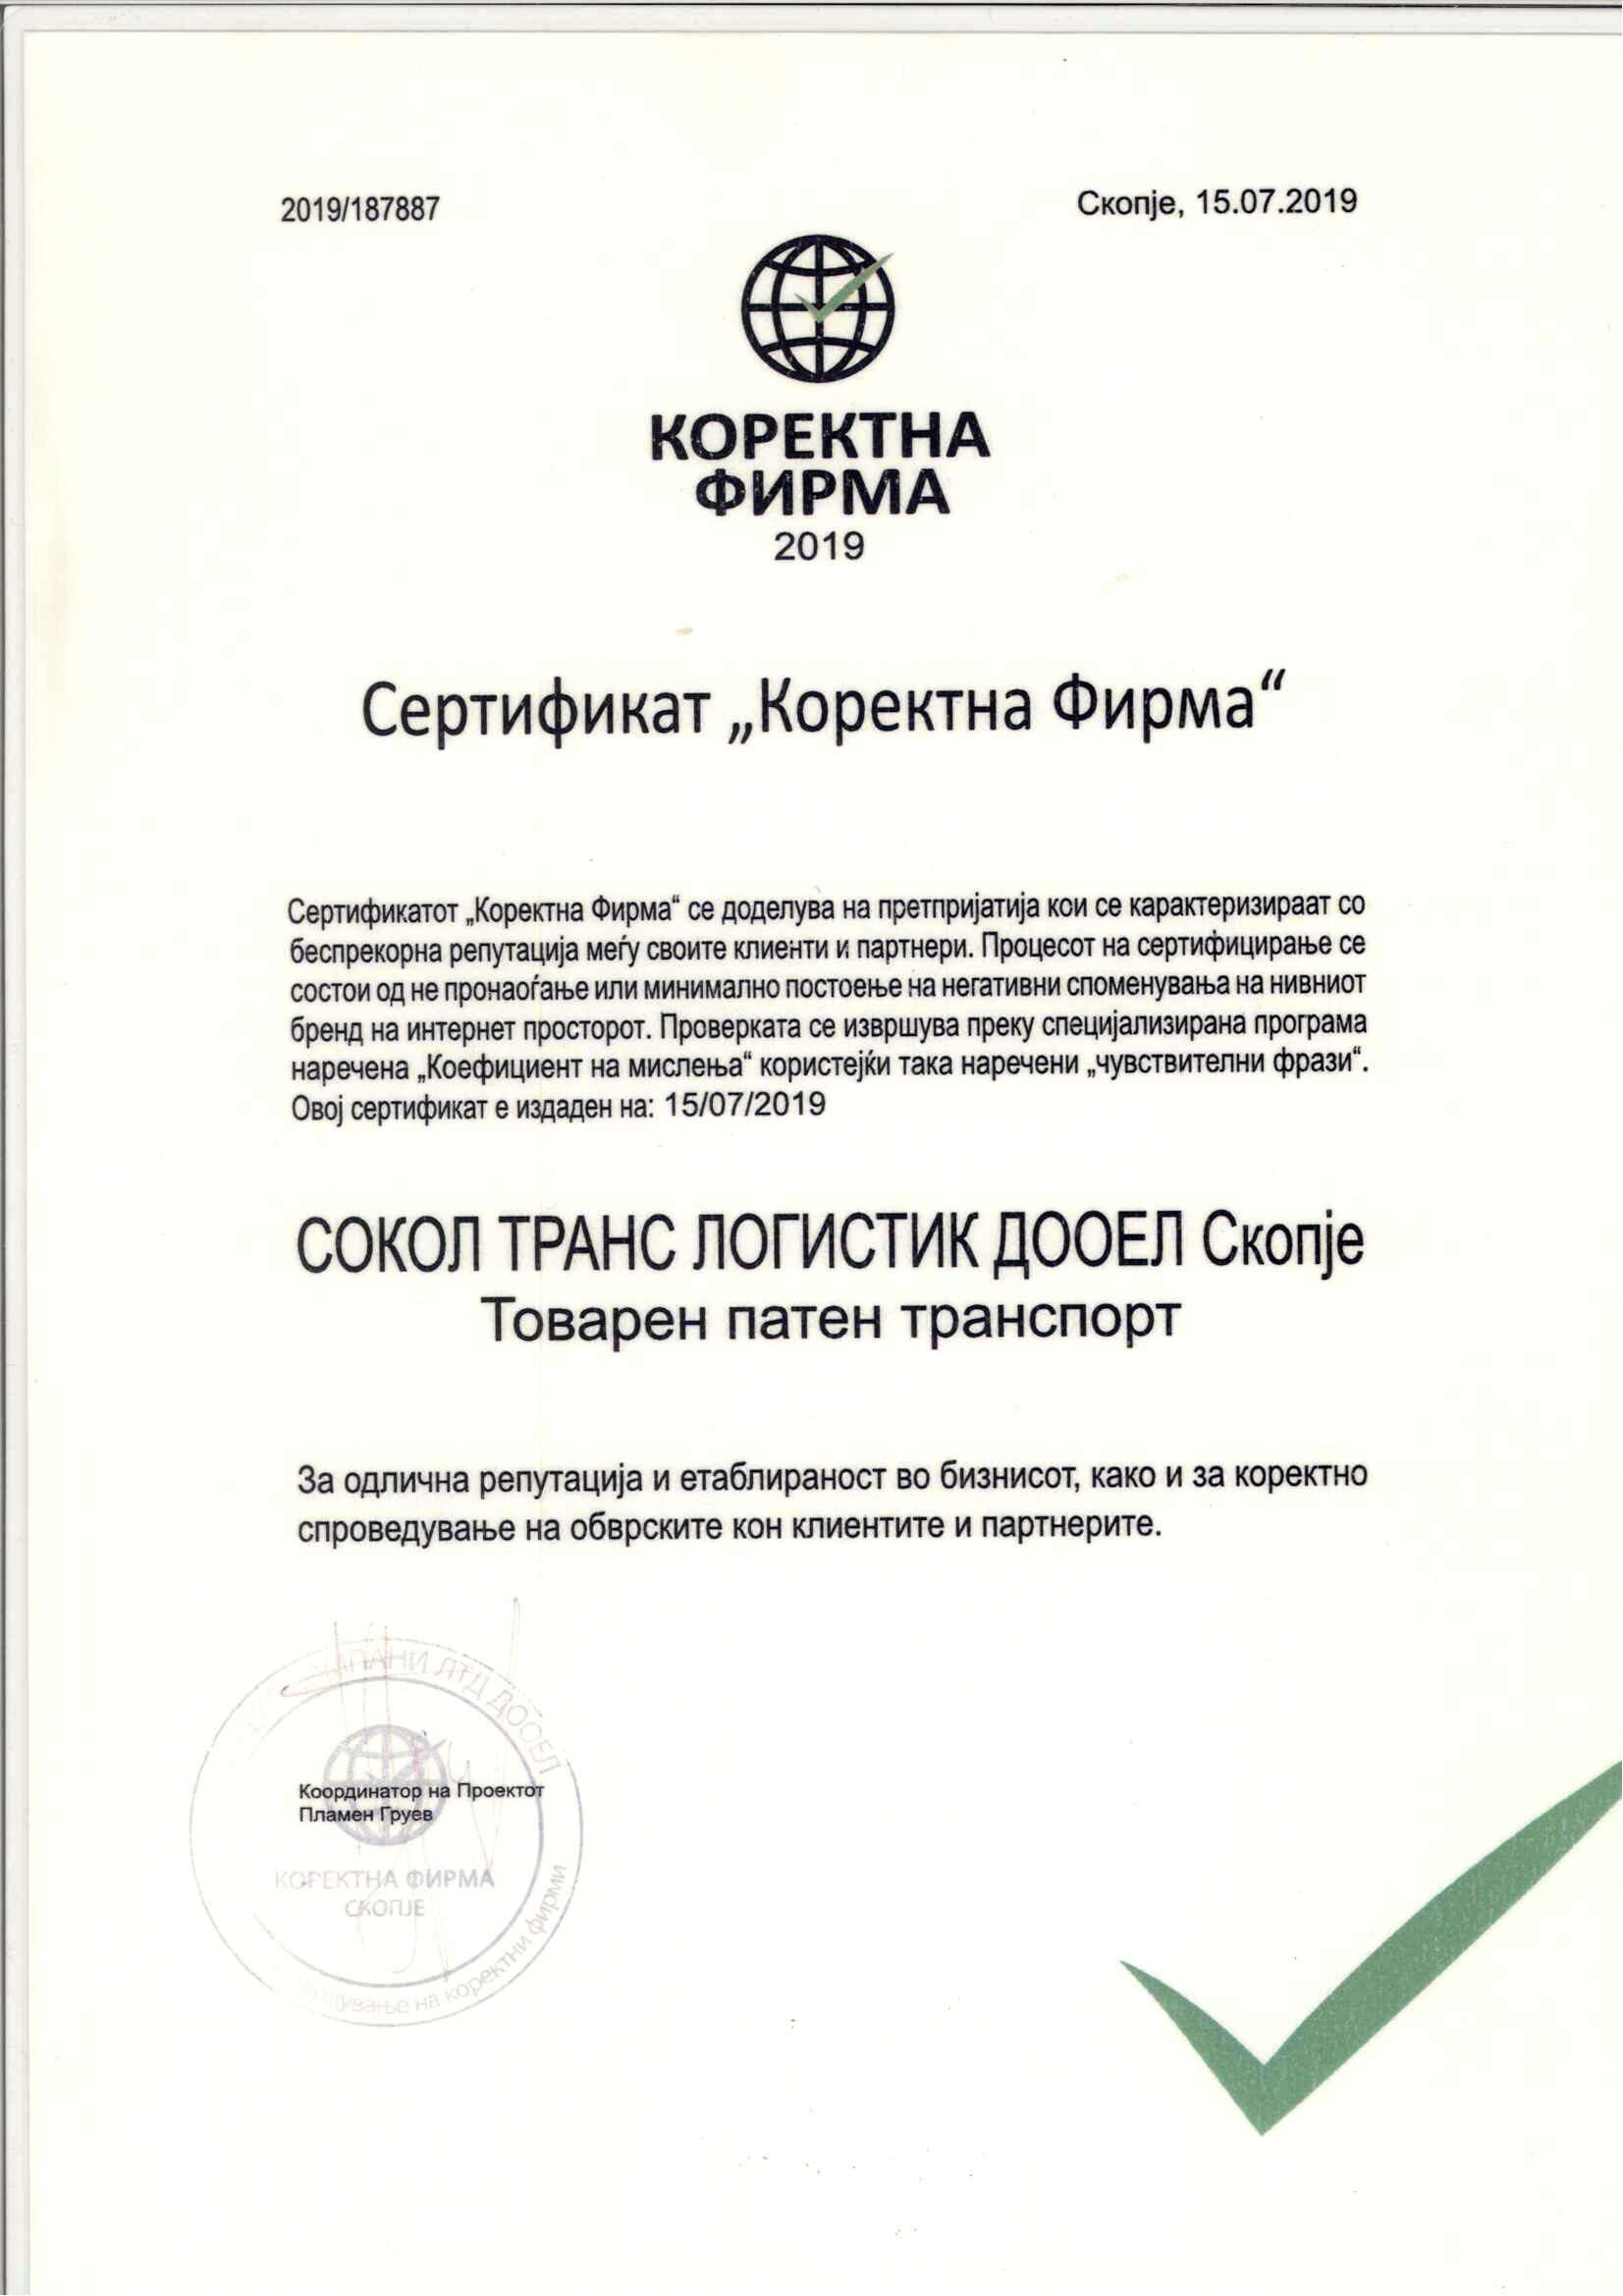 Certificat 5